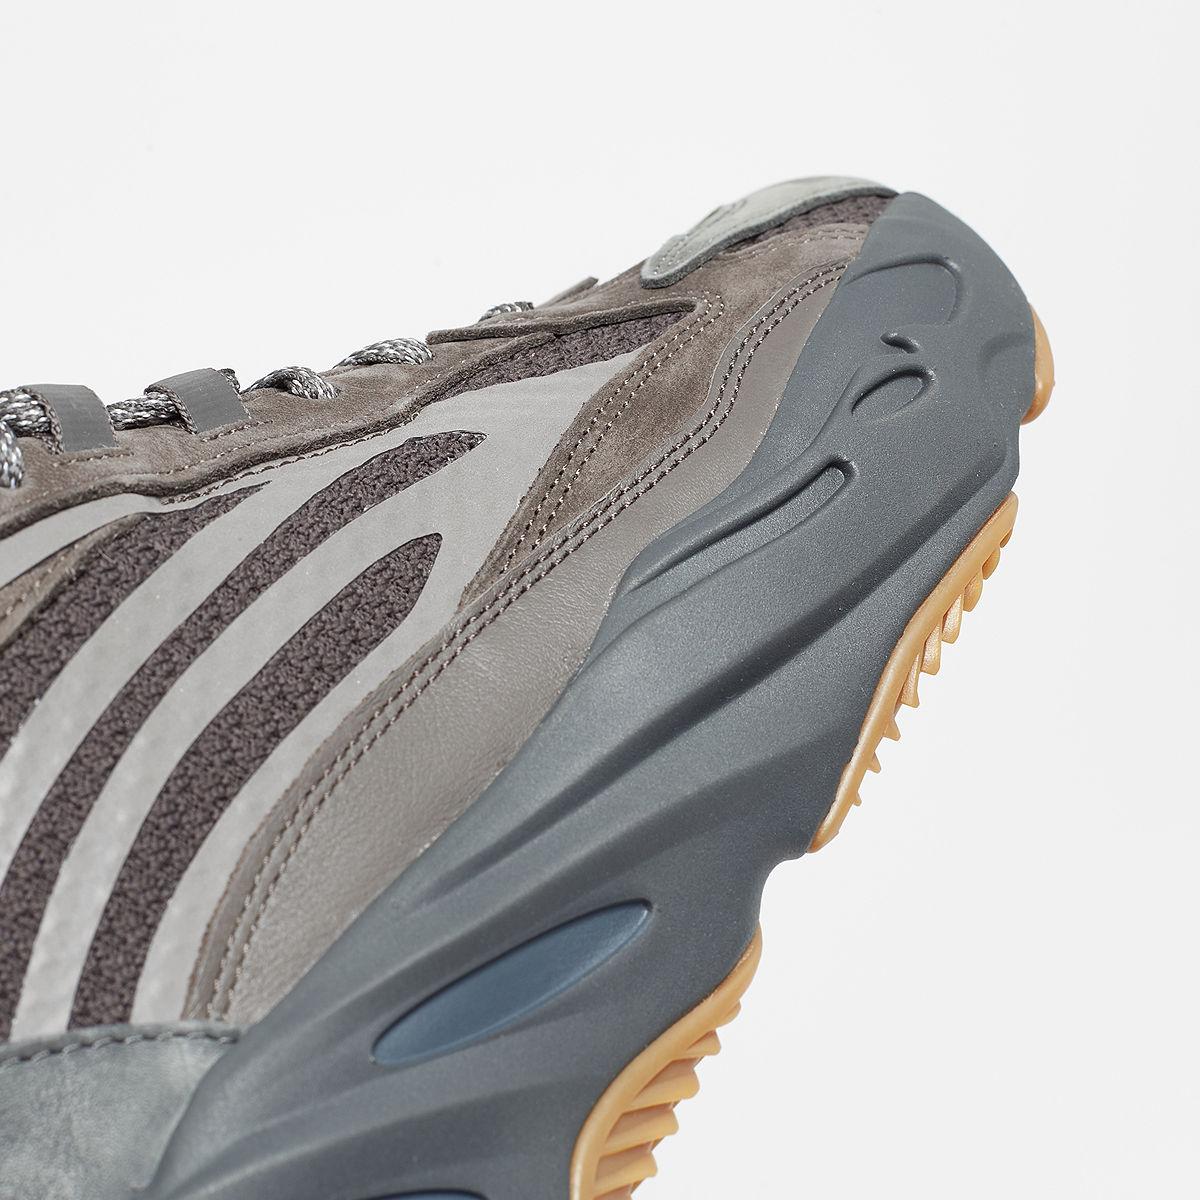 06-adidas-yeezy-boost-700-geode-eg6860